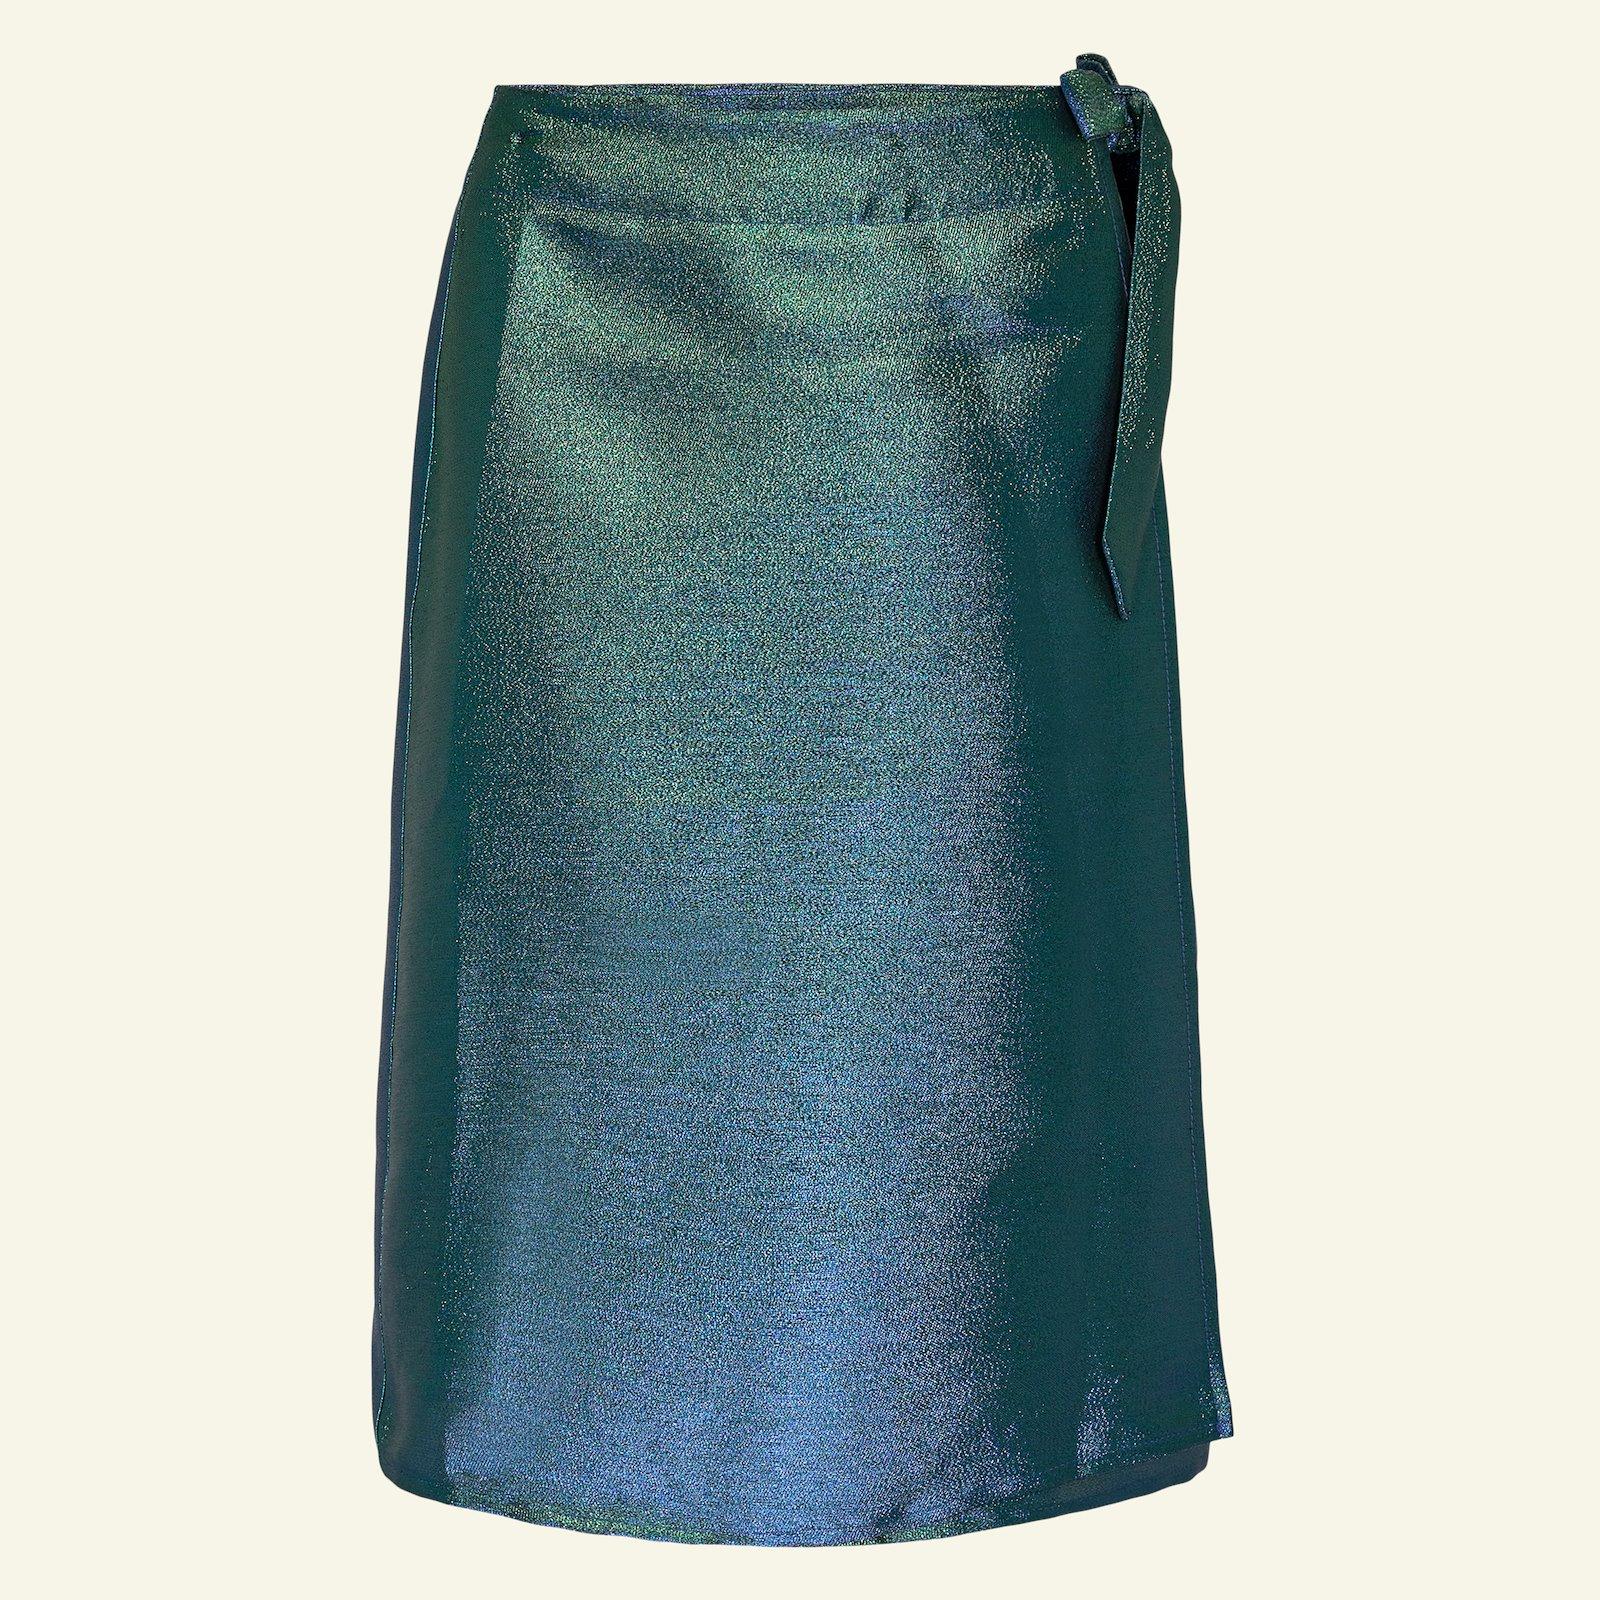 Woven jacquard with green/blue lurex p21045_400322_sskit